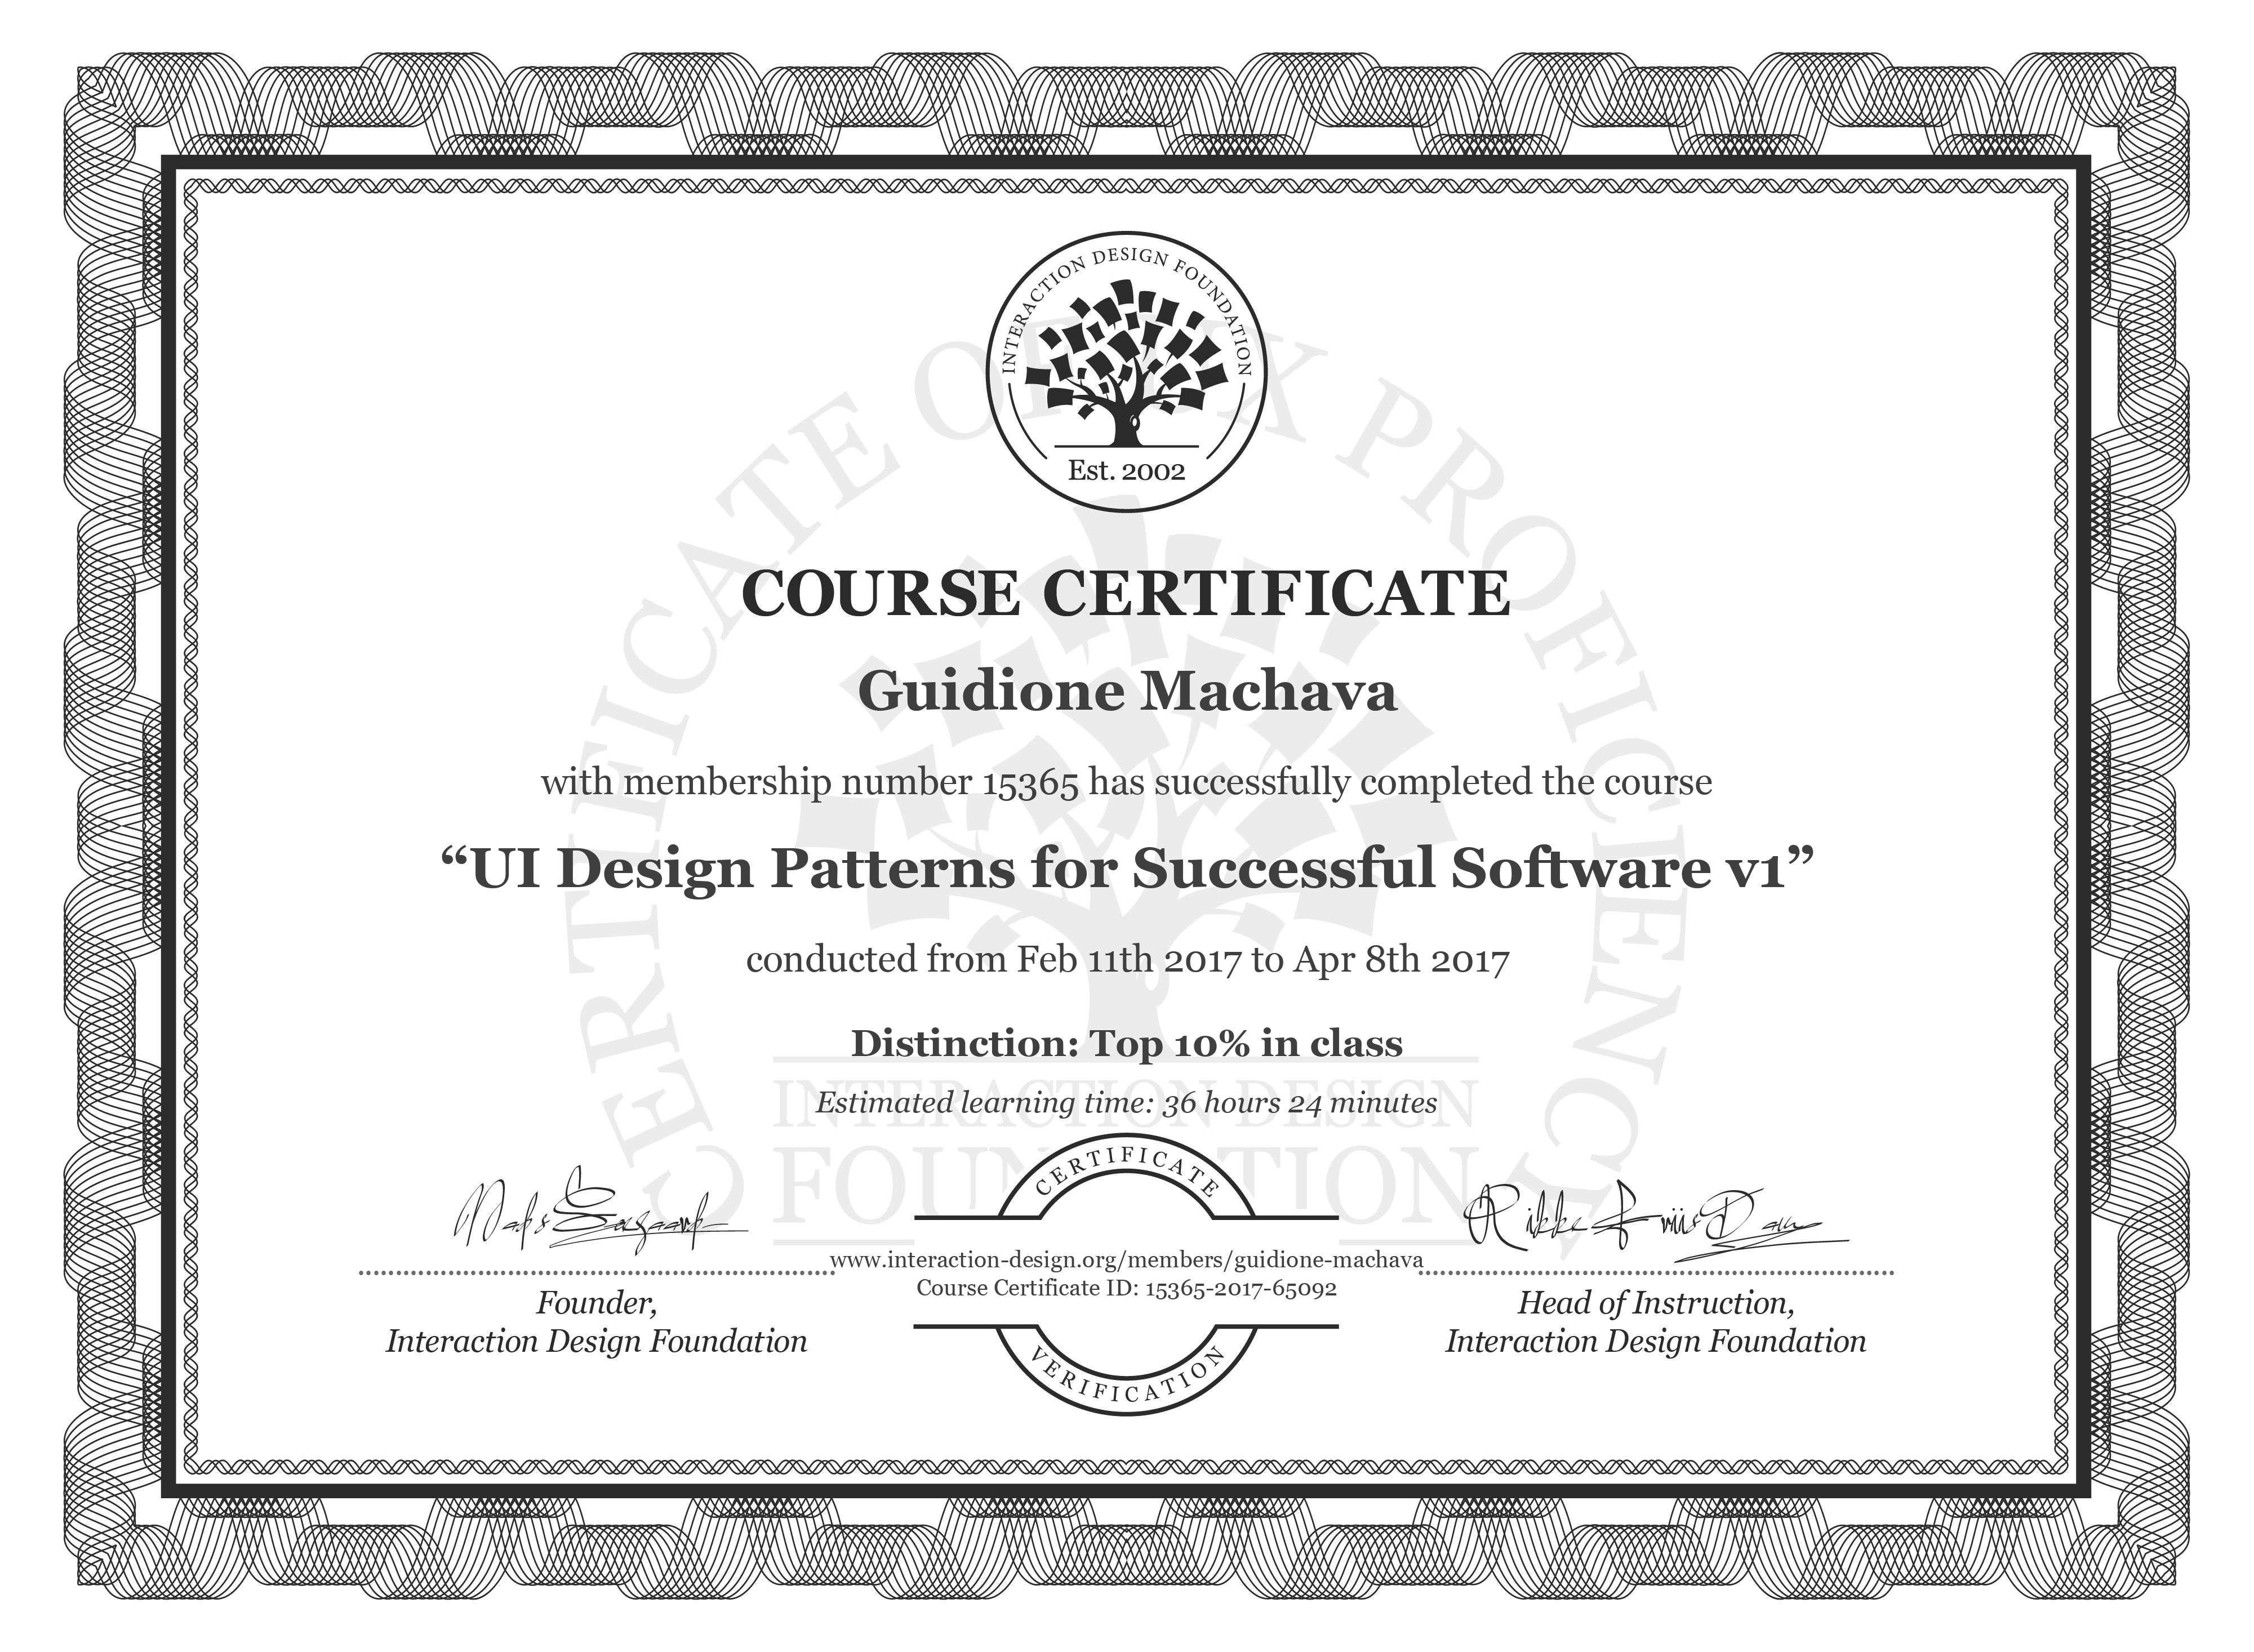 Guidione Machava's Course Certificate: UI Design Patterns for Successful Software